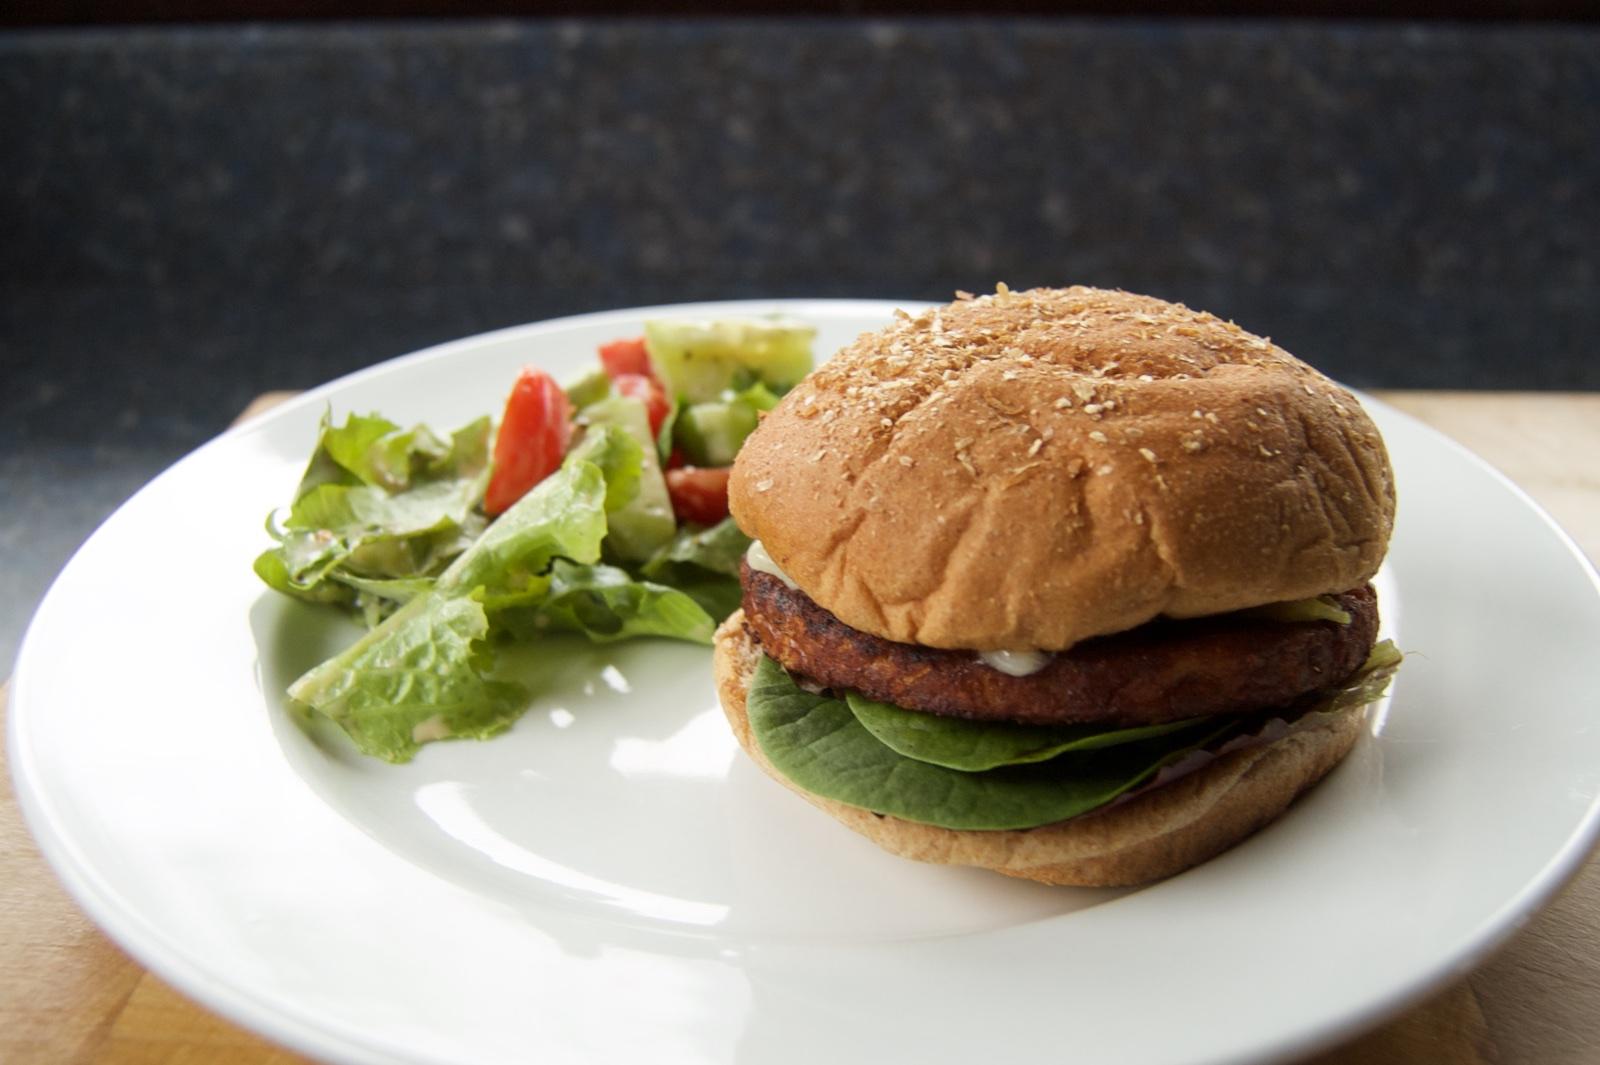 http://blog.rickk.com/food/2017/01/20/ate.2017.01.20.l.jpg